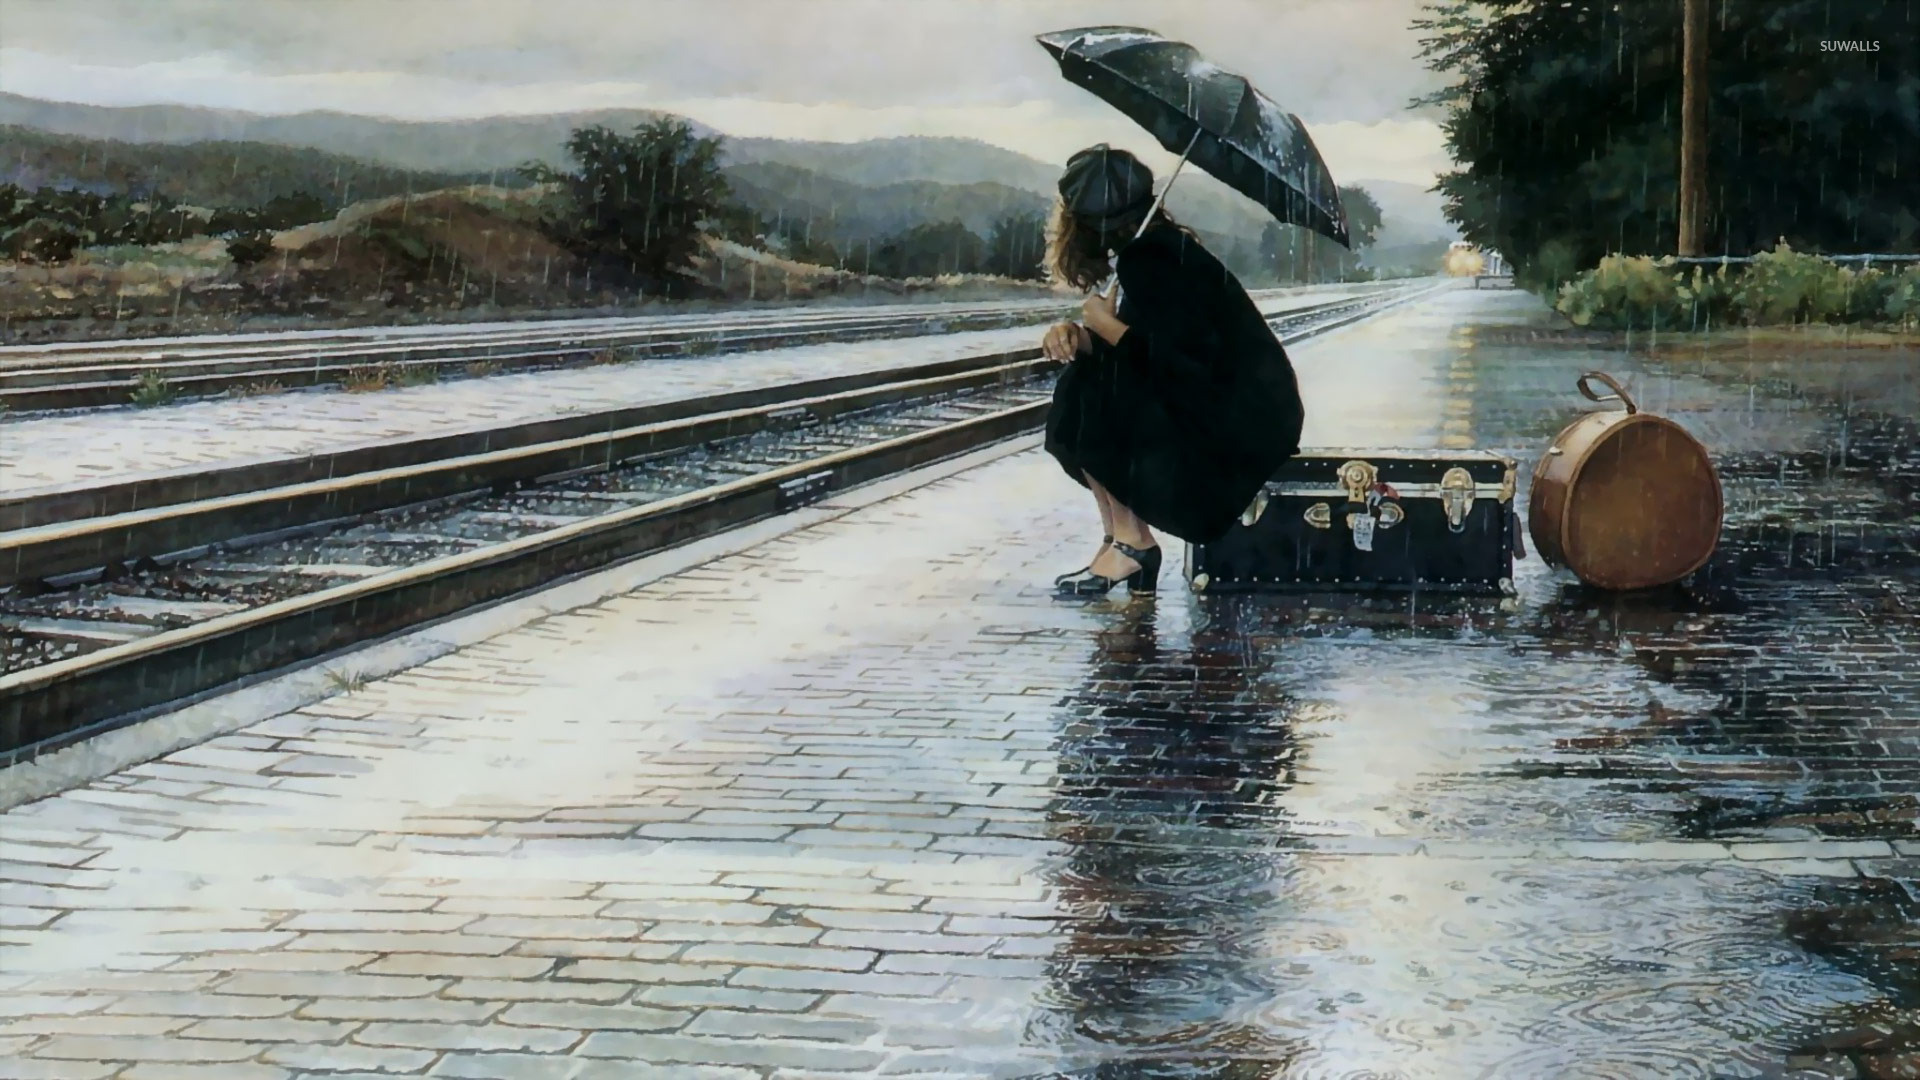 Rain Wallpaper 1920x1080